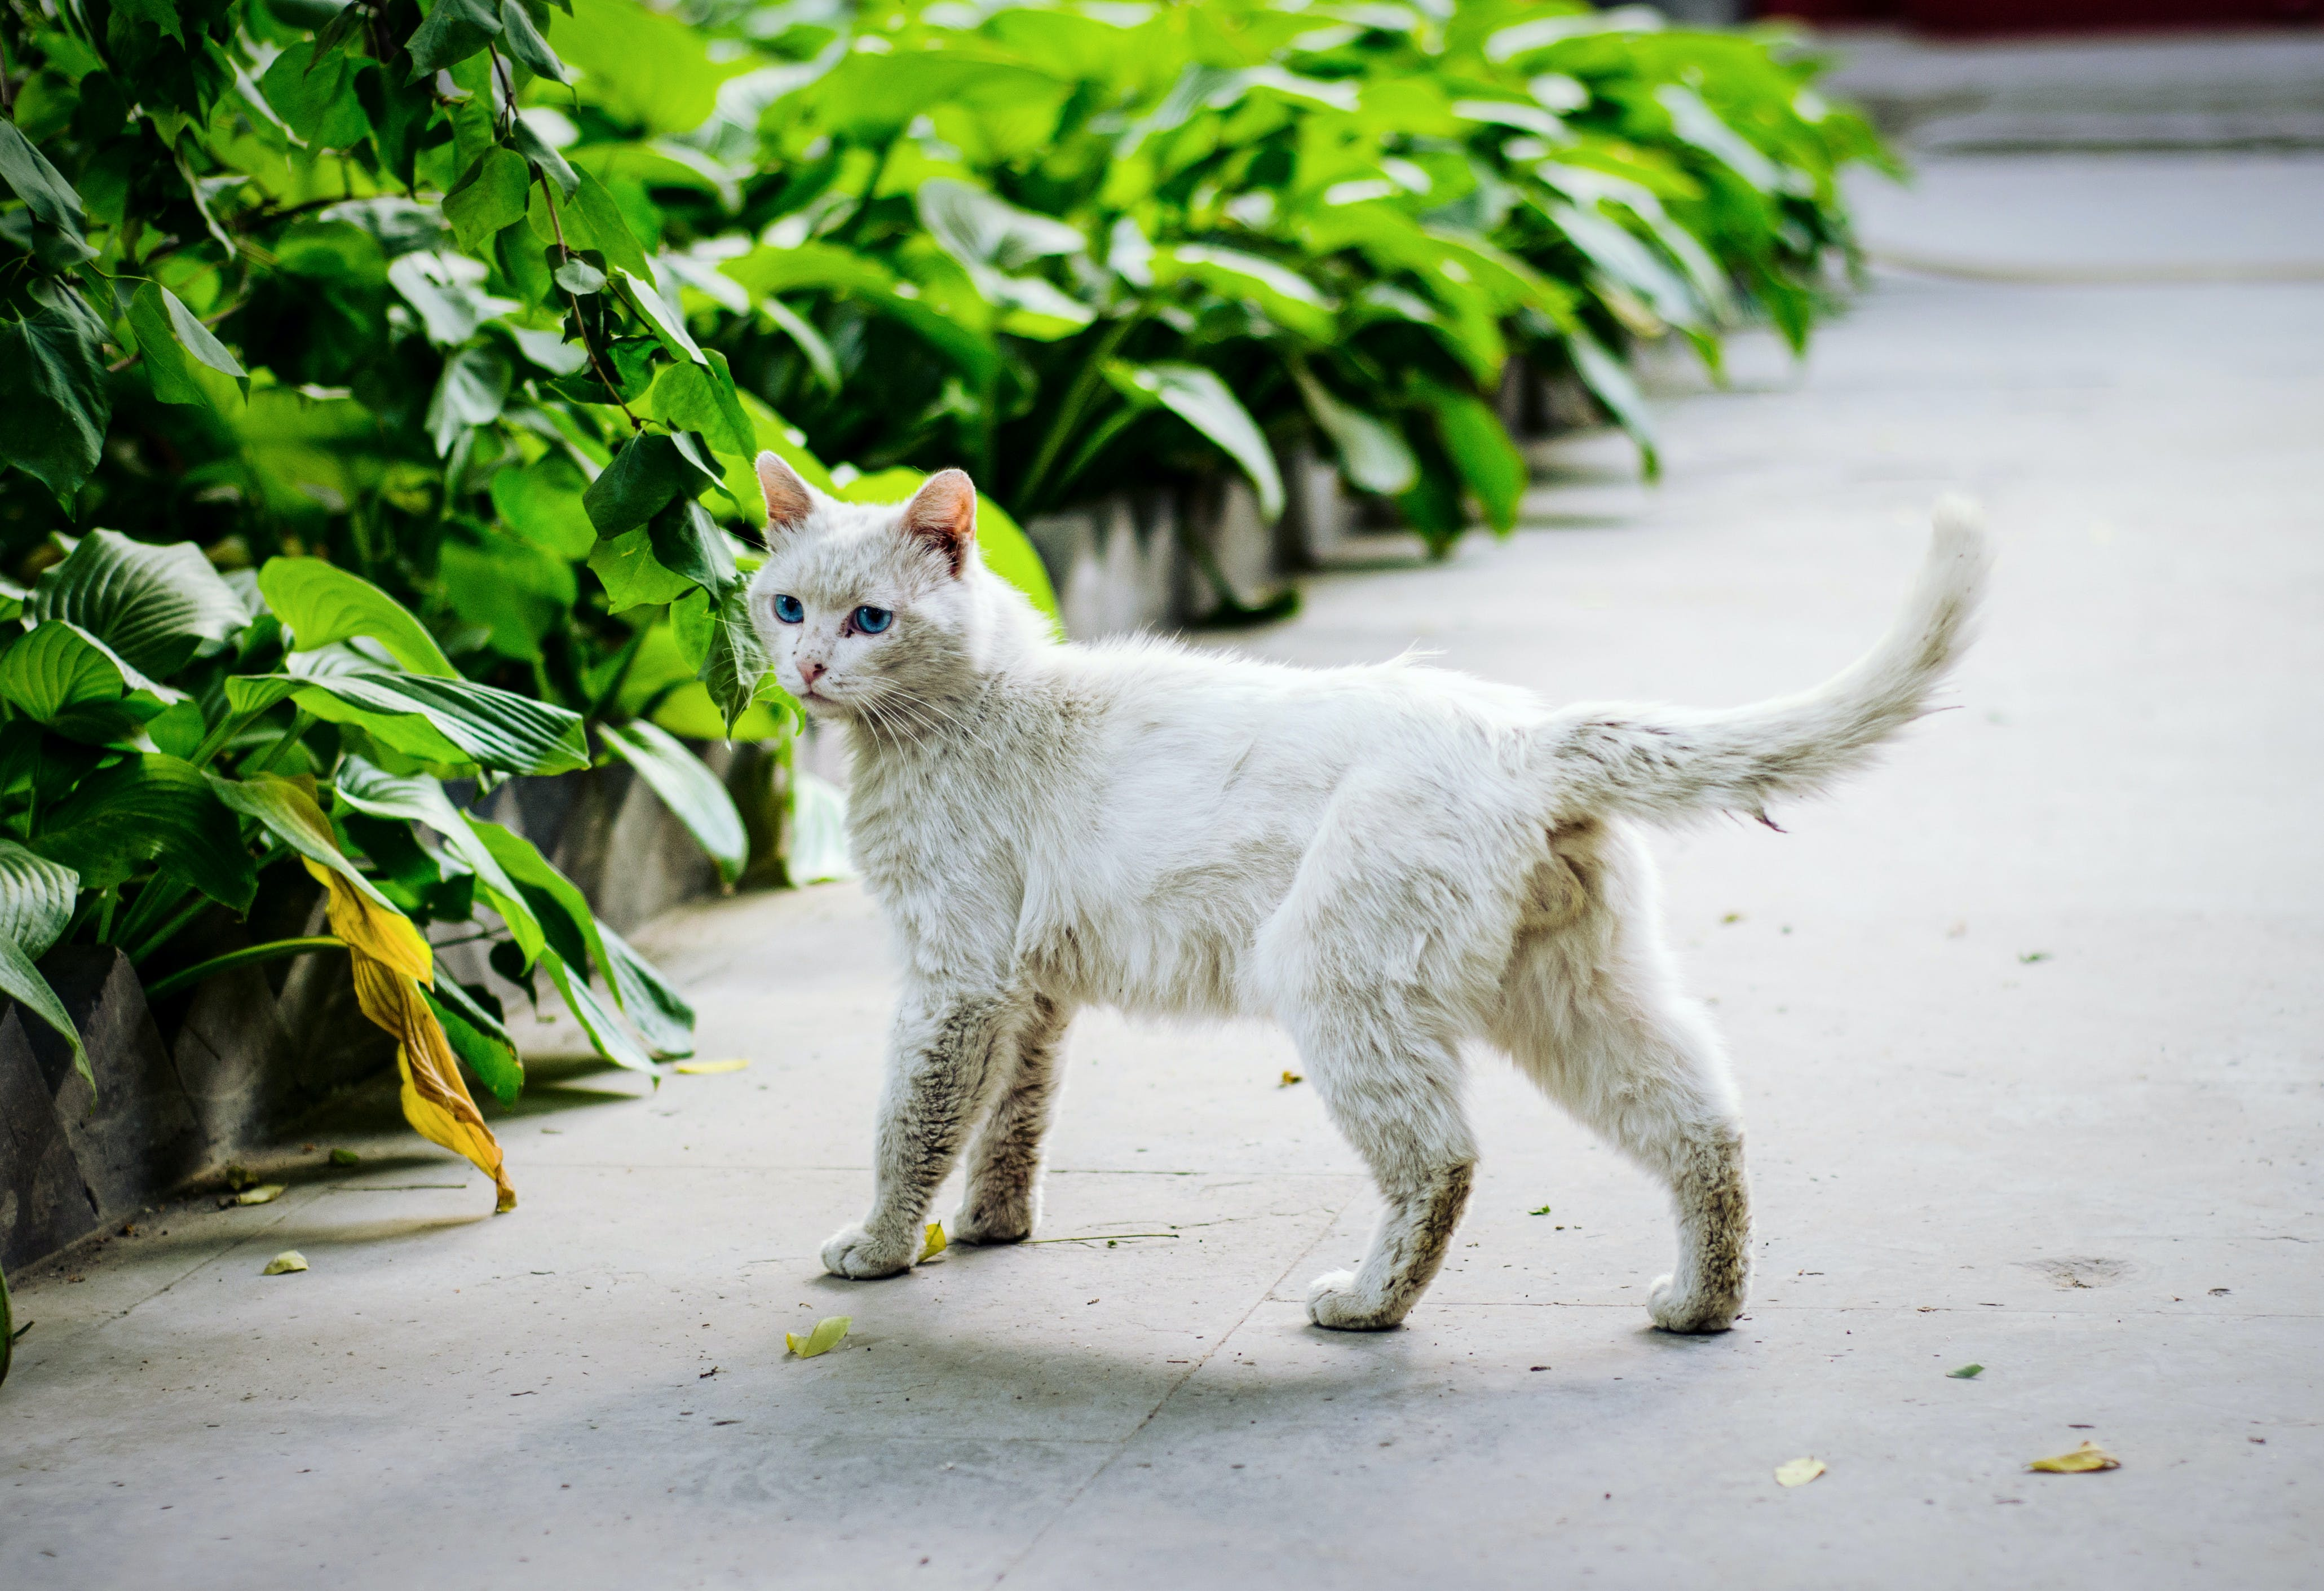 Darmowe zdjęcie z galerii z koci, kociak, kot, kotek